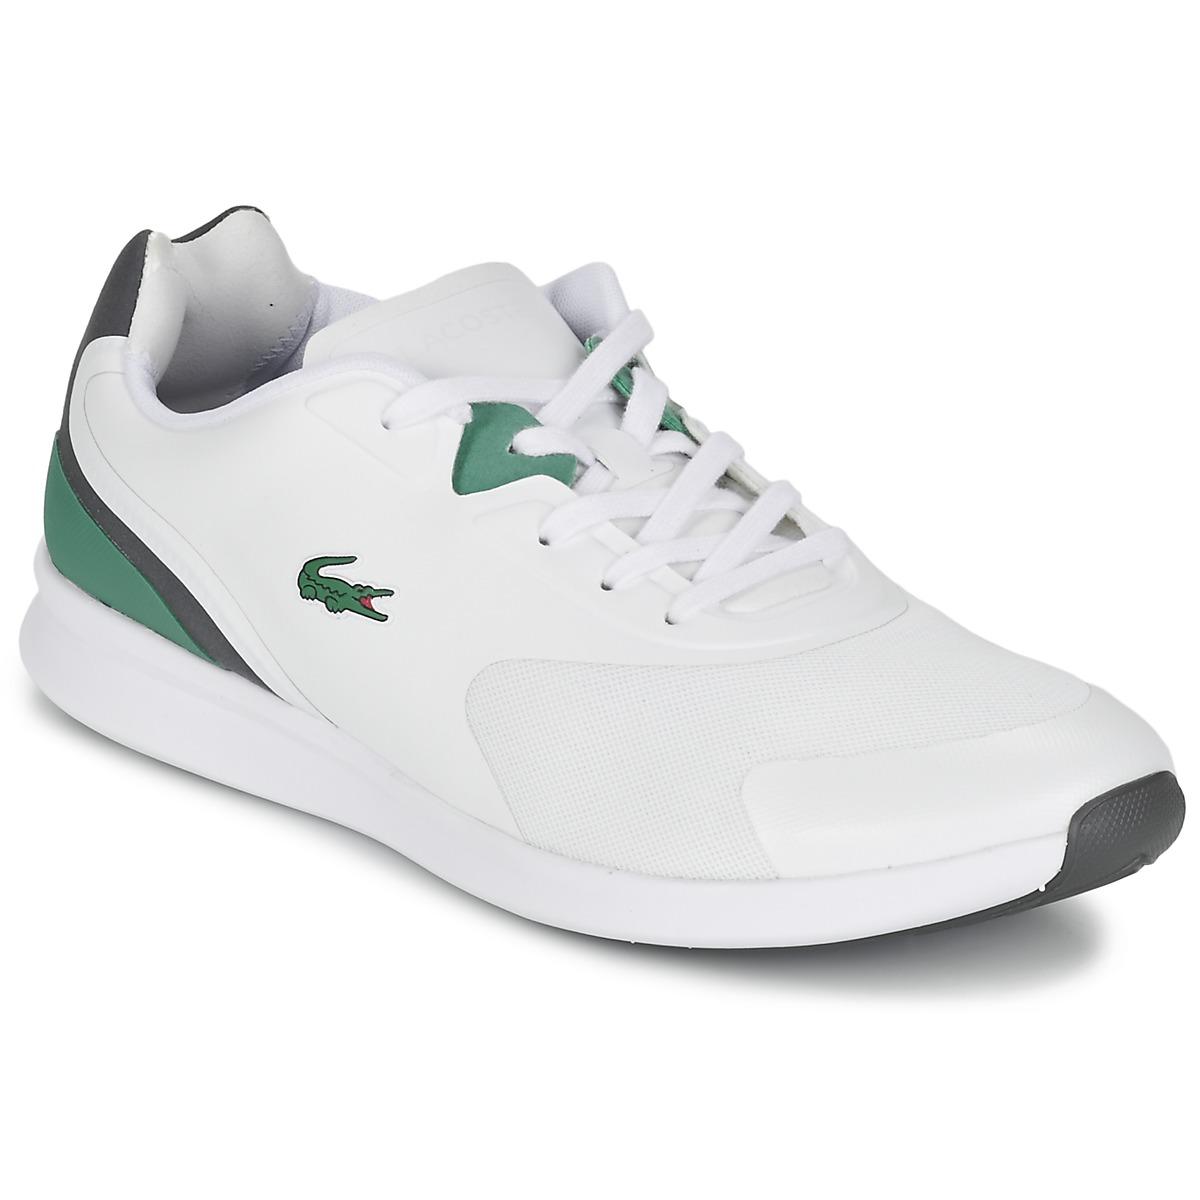 Lacoste LTR.01 316 1 Blanc / Vert